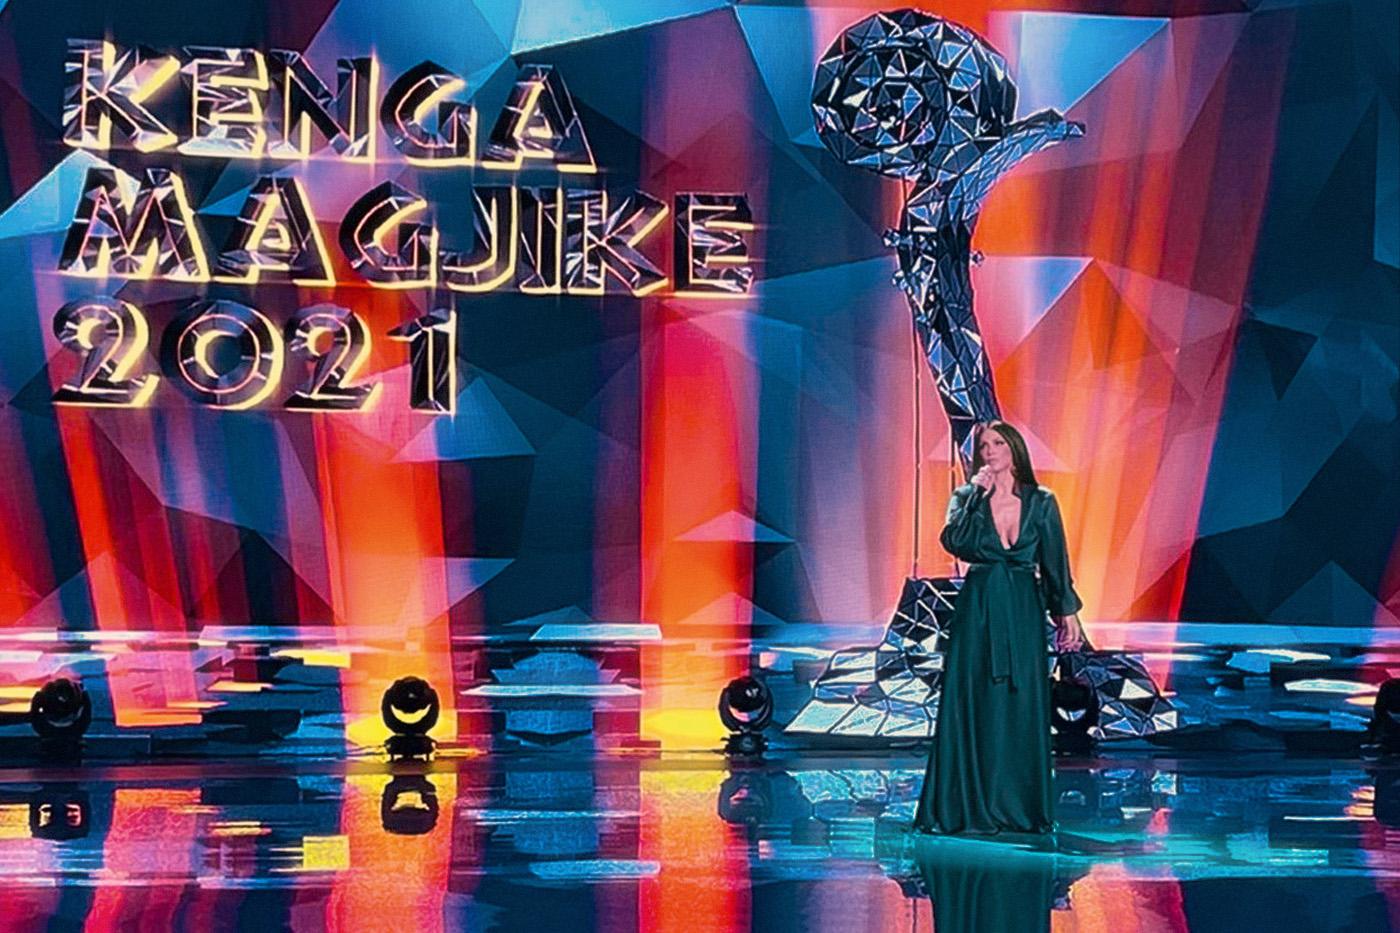 Kenga-Magjike-Valeria-Altobelli-Redcarpet-magazine